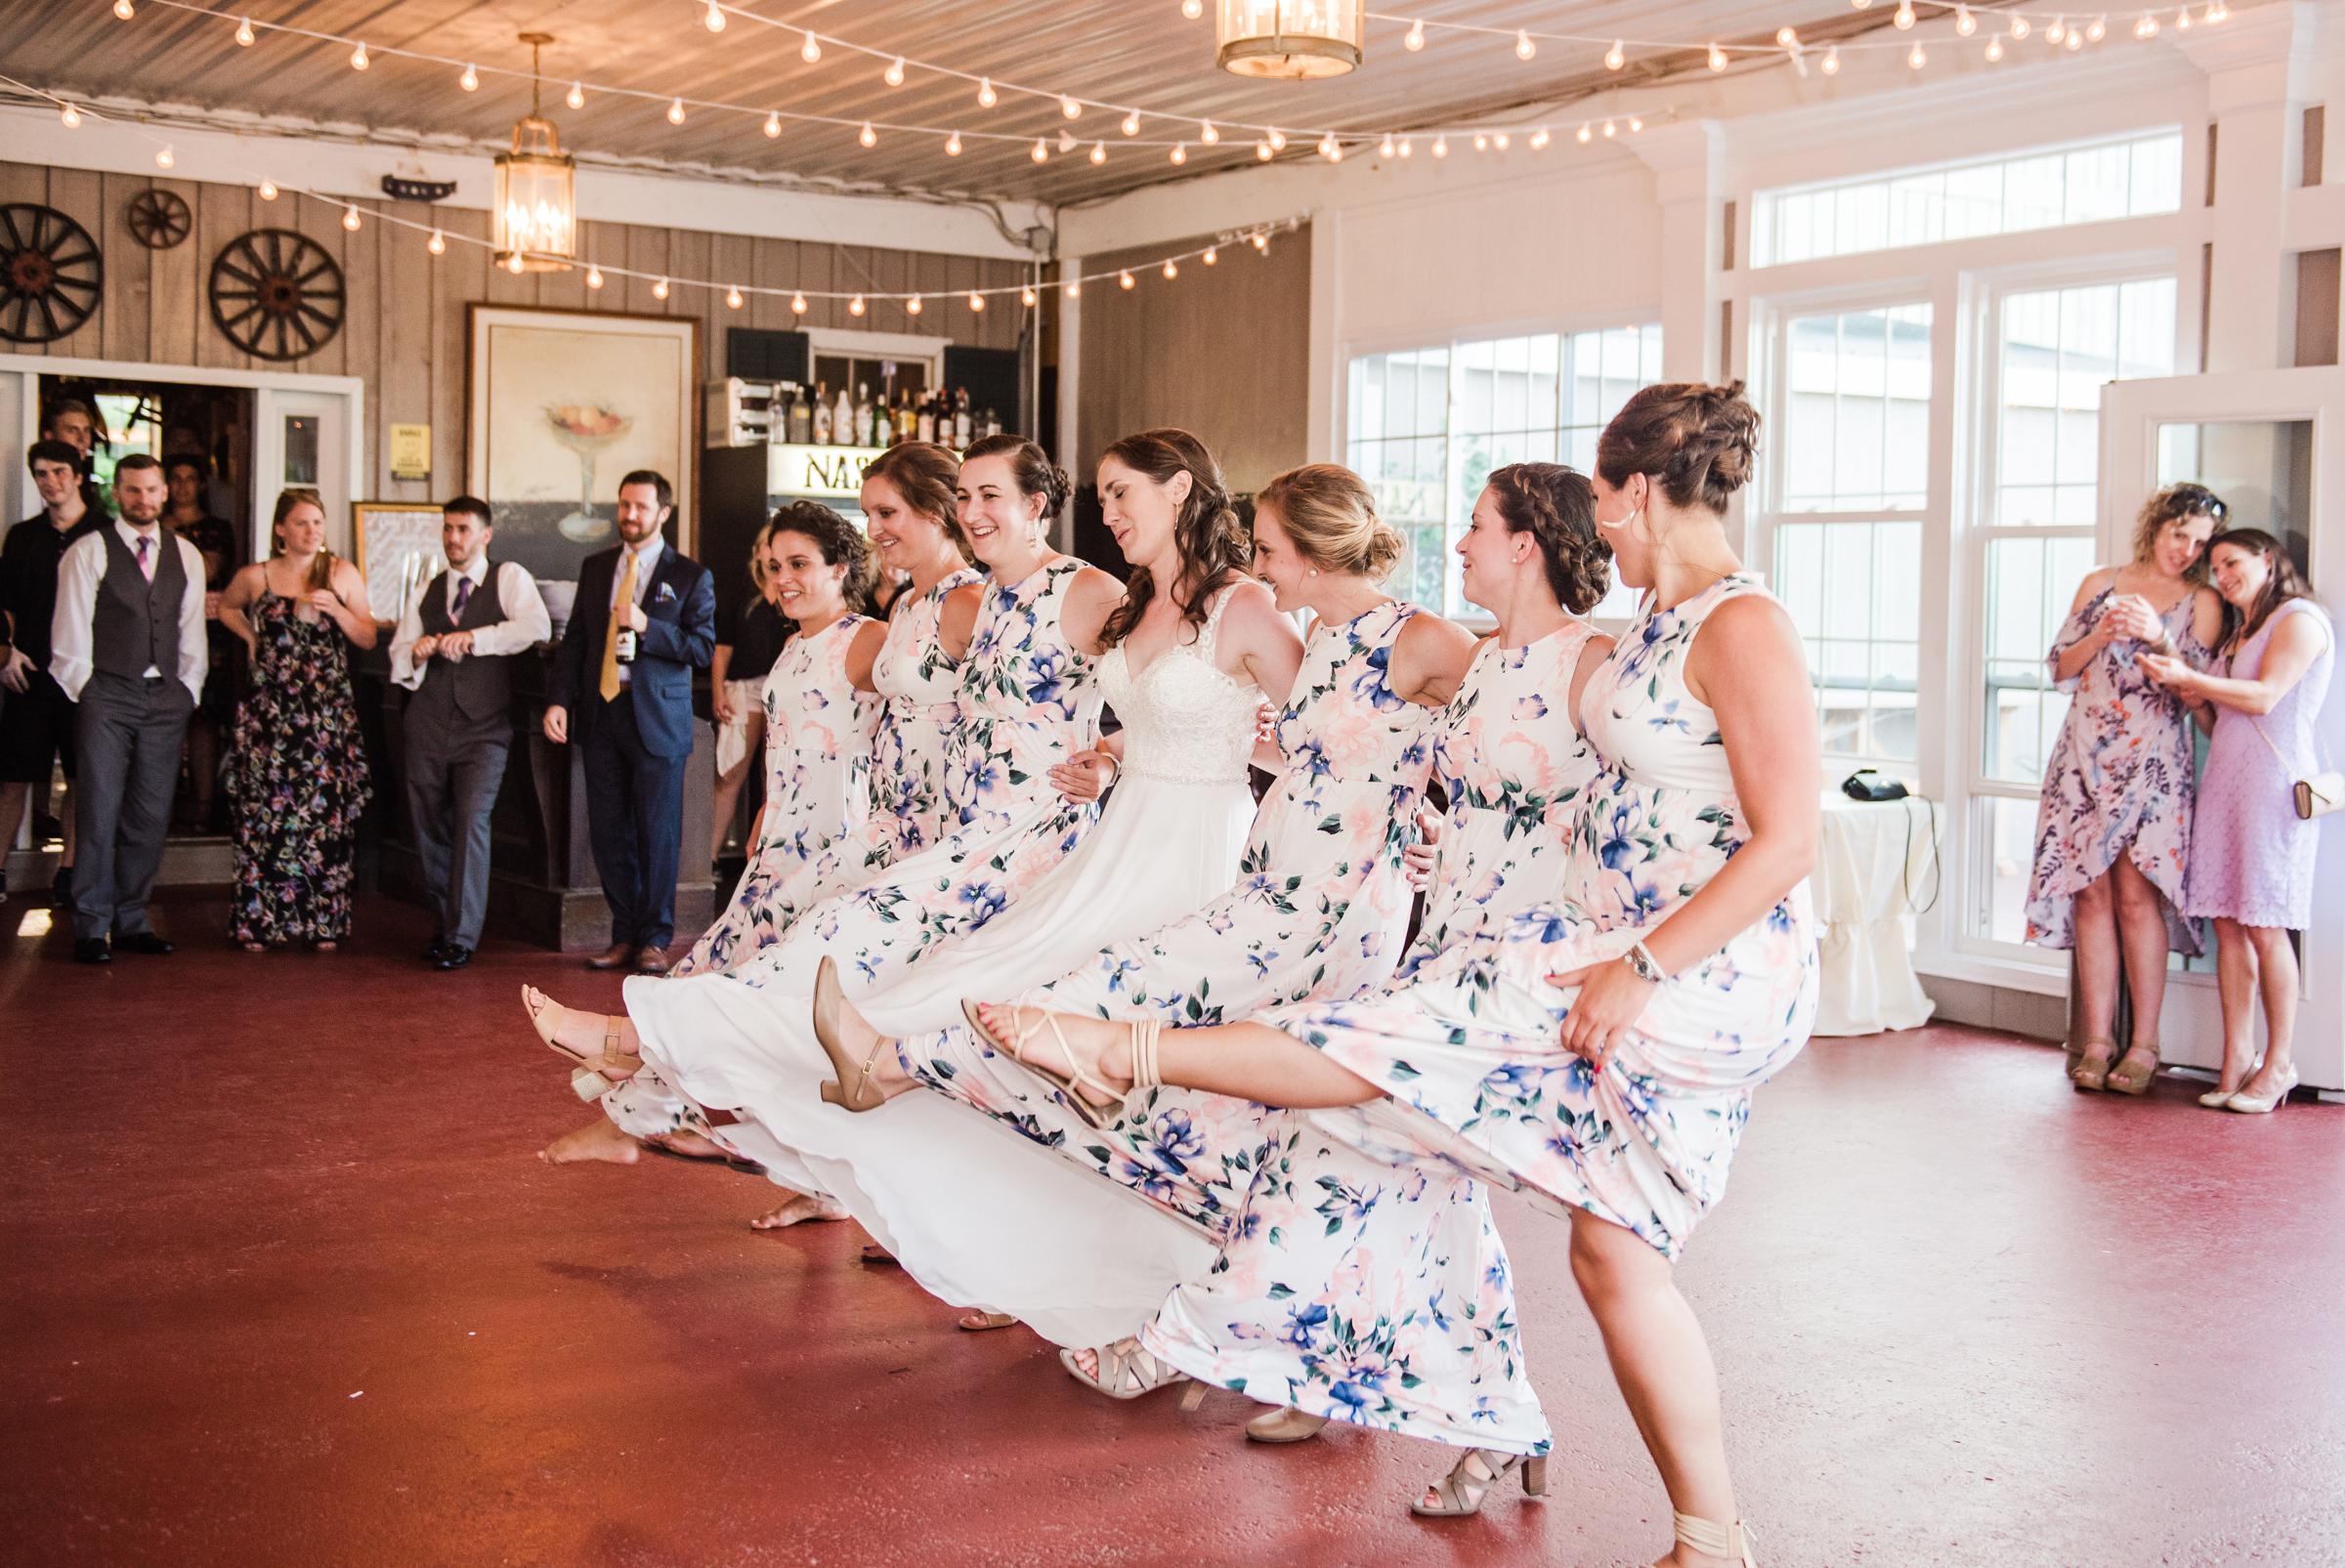 Jerris_Wadsworth_Wedding_Barn_Rochester_Wedding_JILL_STUDIO_Rochester_NY_Photographer_DSC_2938.jpg